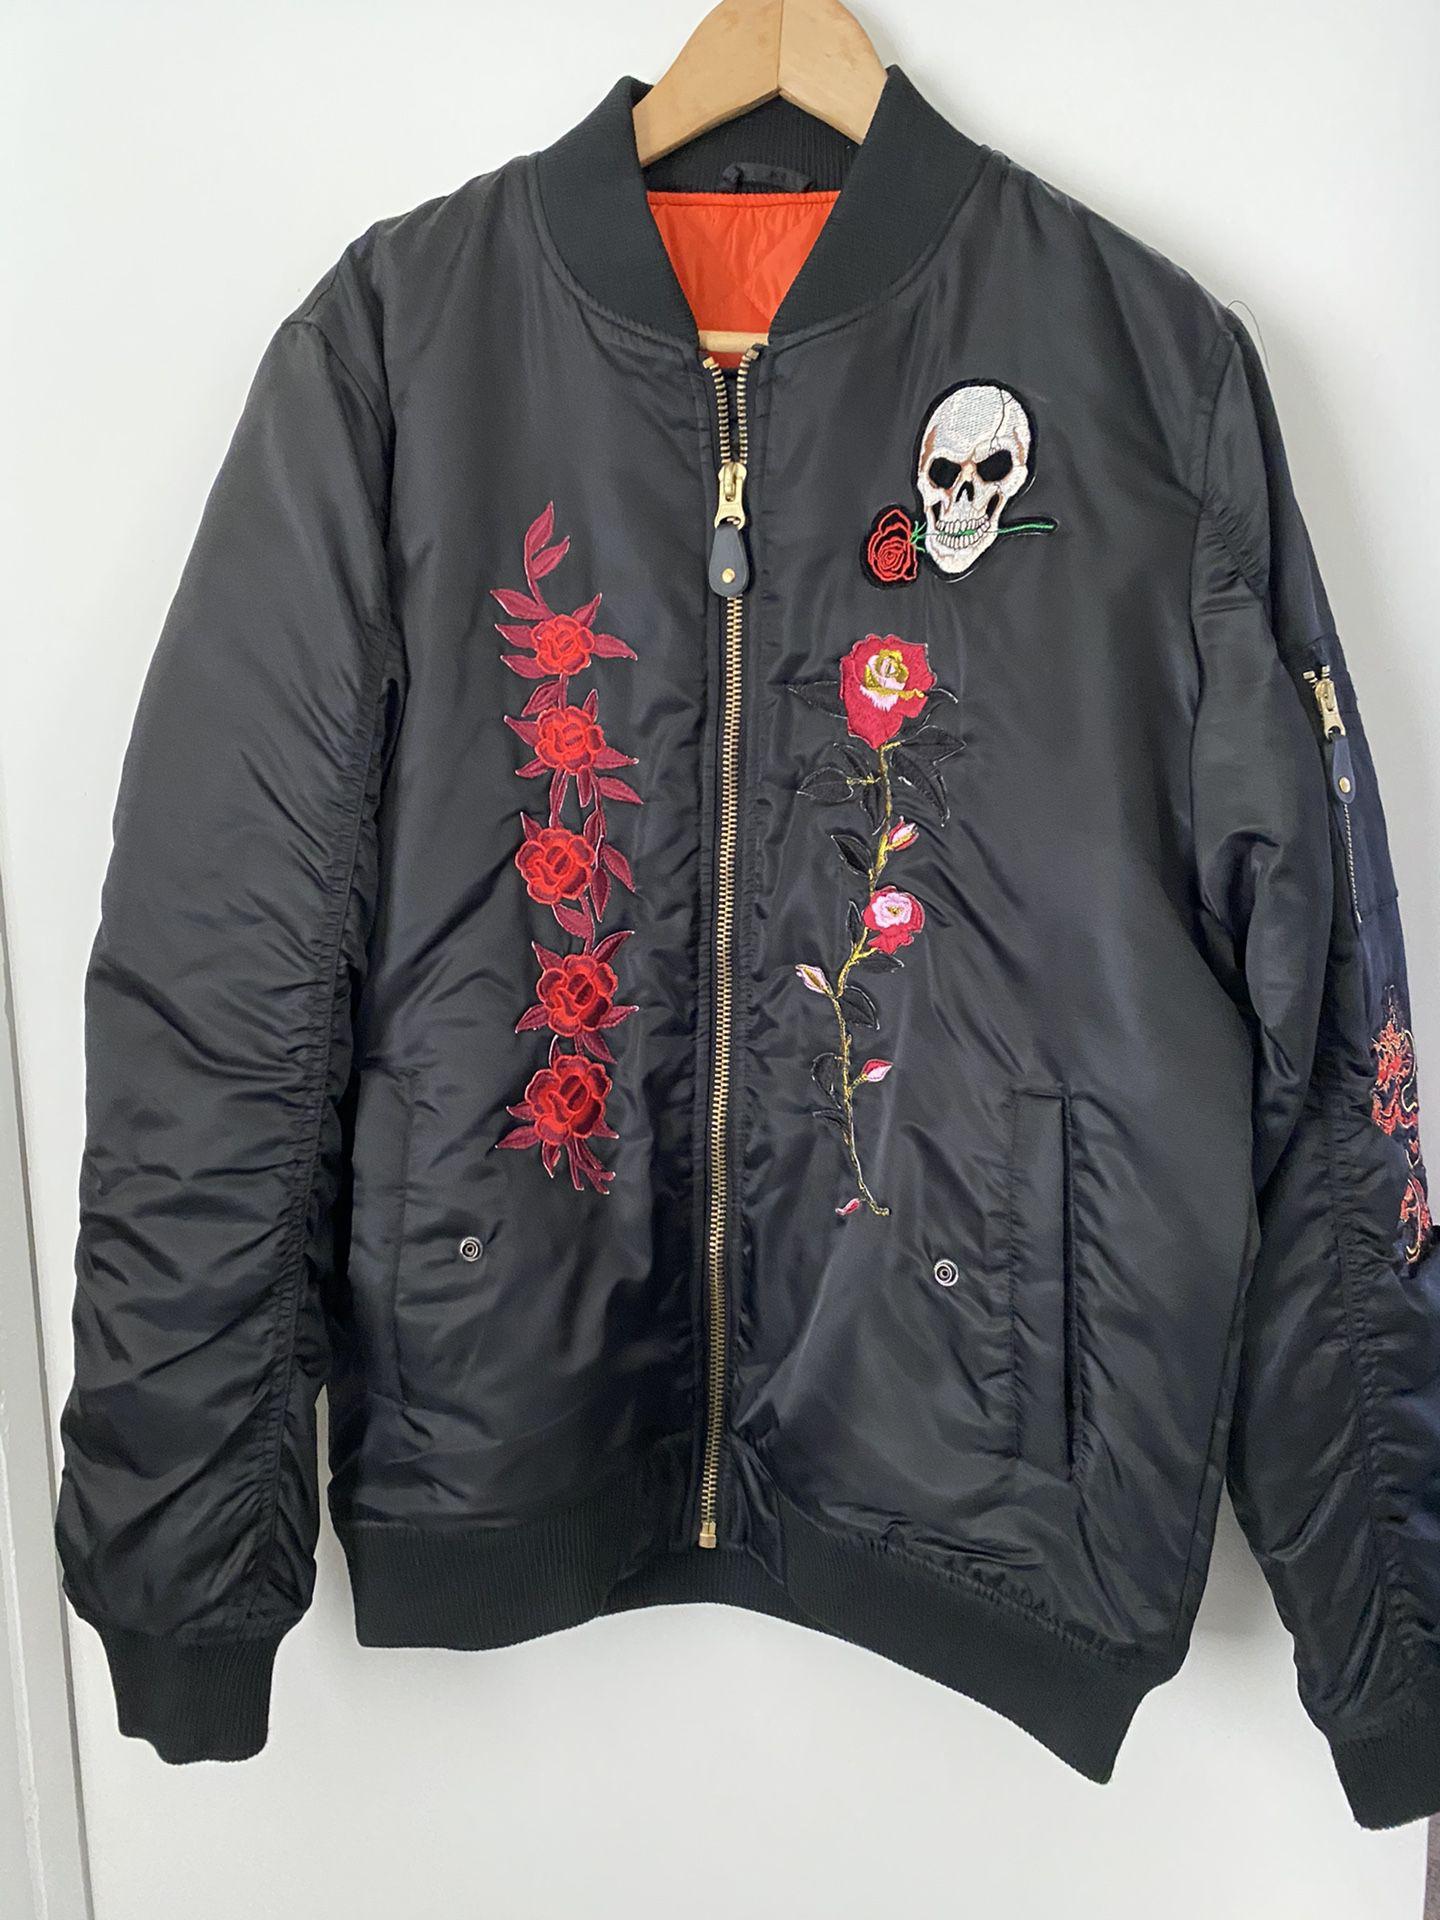 Trap house Jodeci Bomber jacket